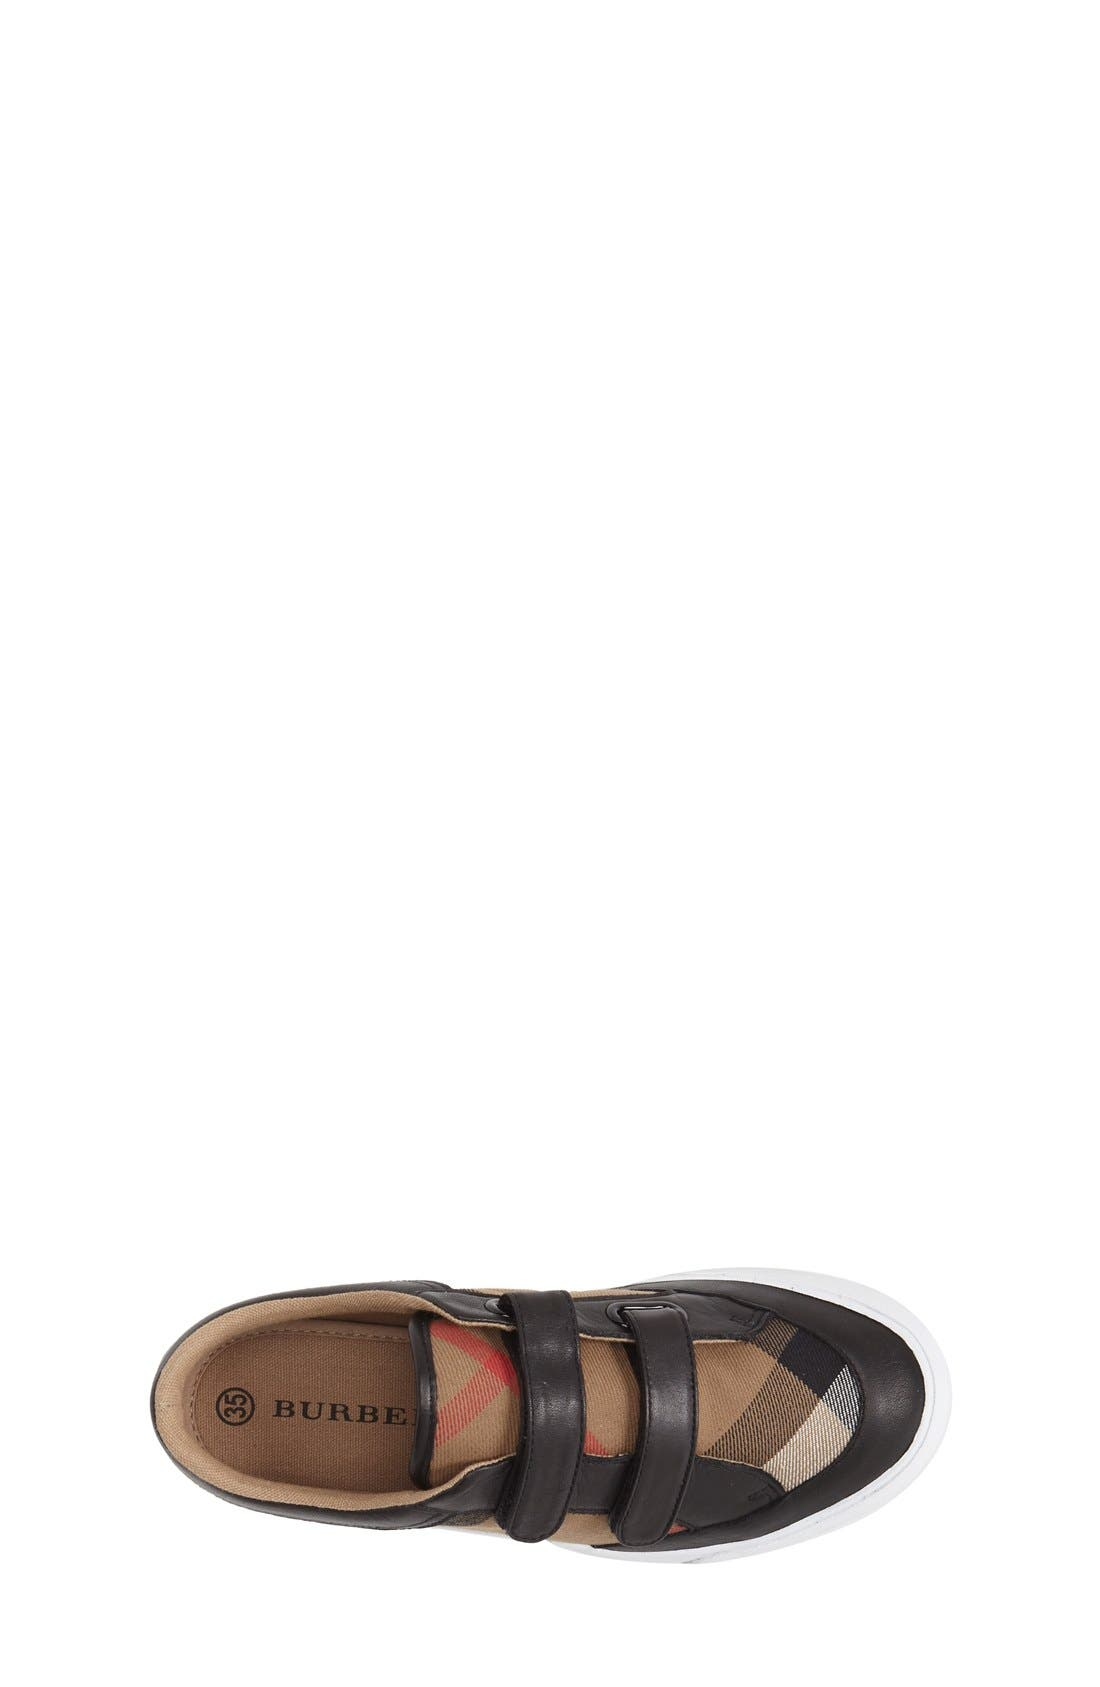 BURBERRY,                             Mini Heacham Sneaker,                             Alternate thumbnail 4, color,                             001